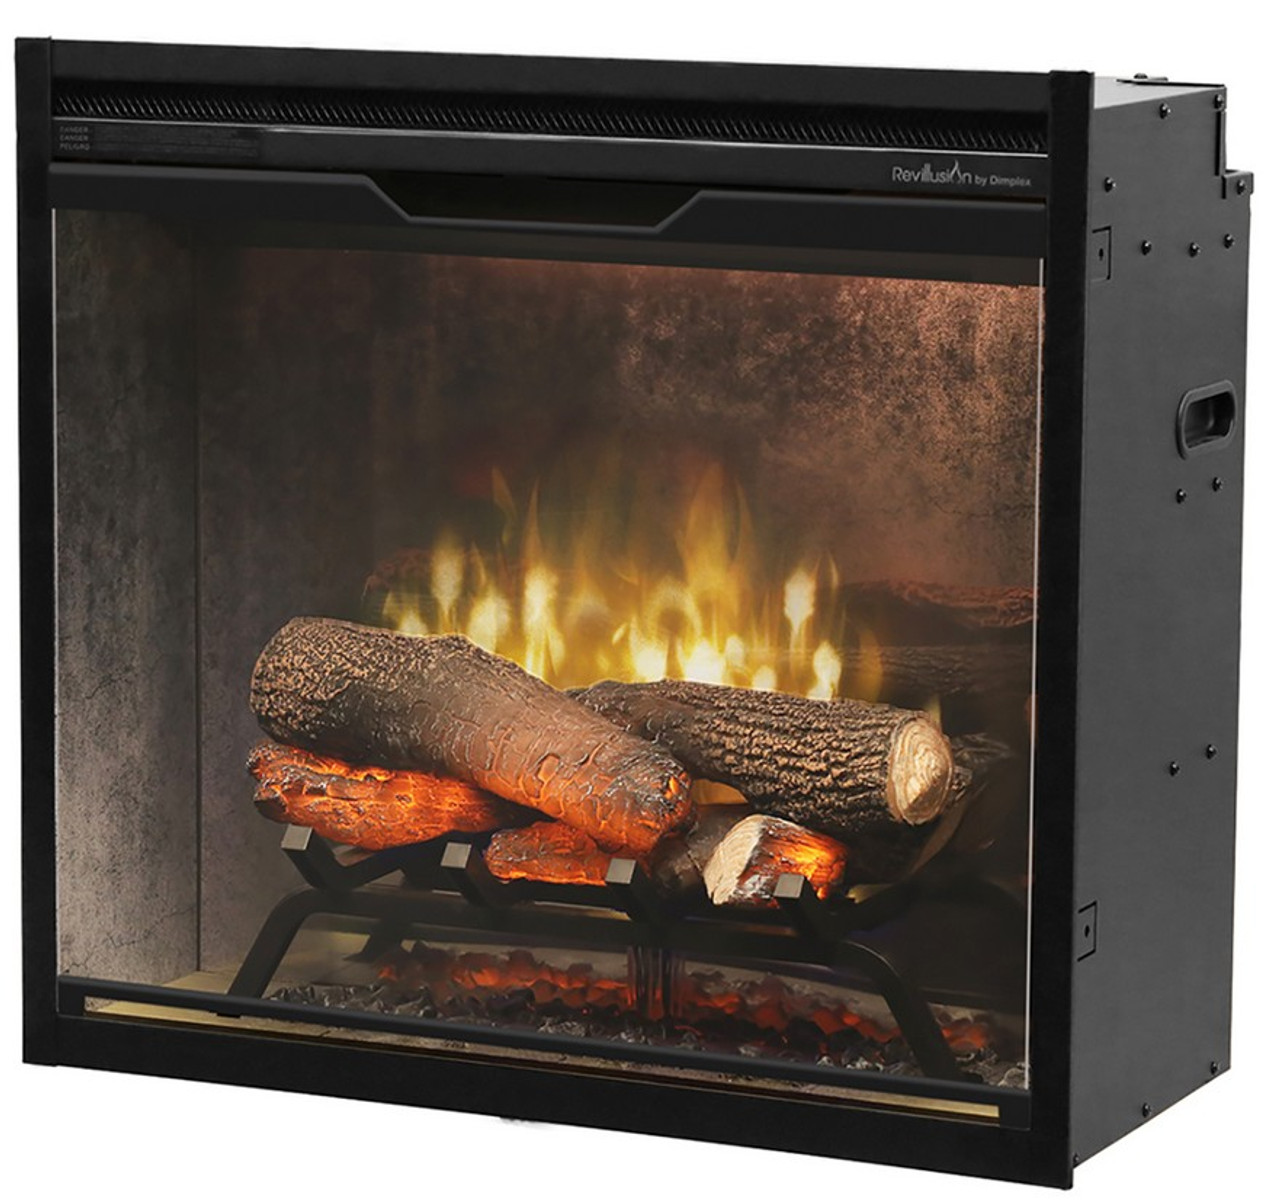 "Revillusion® 24"" Fireplace Insert"